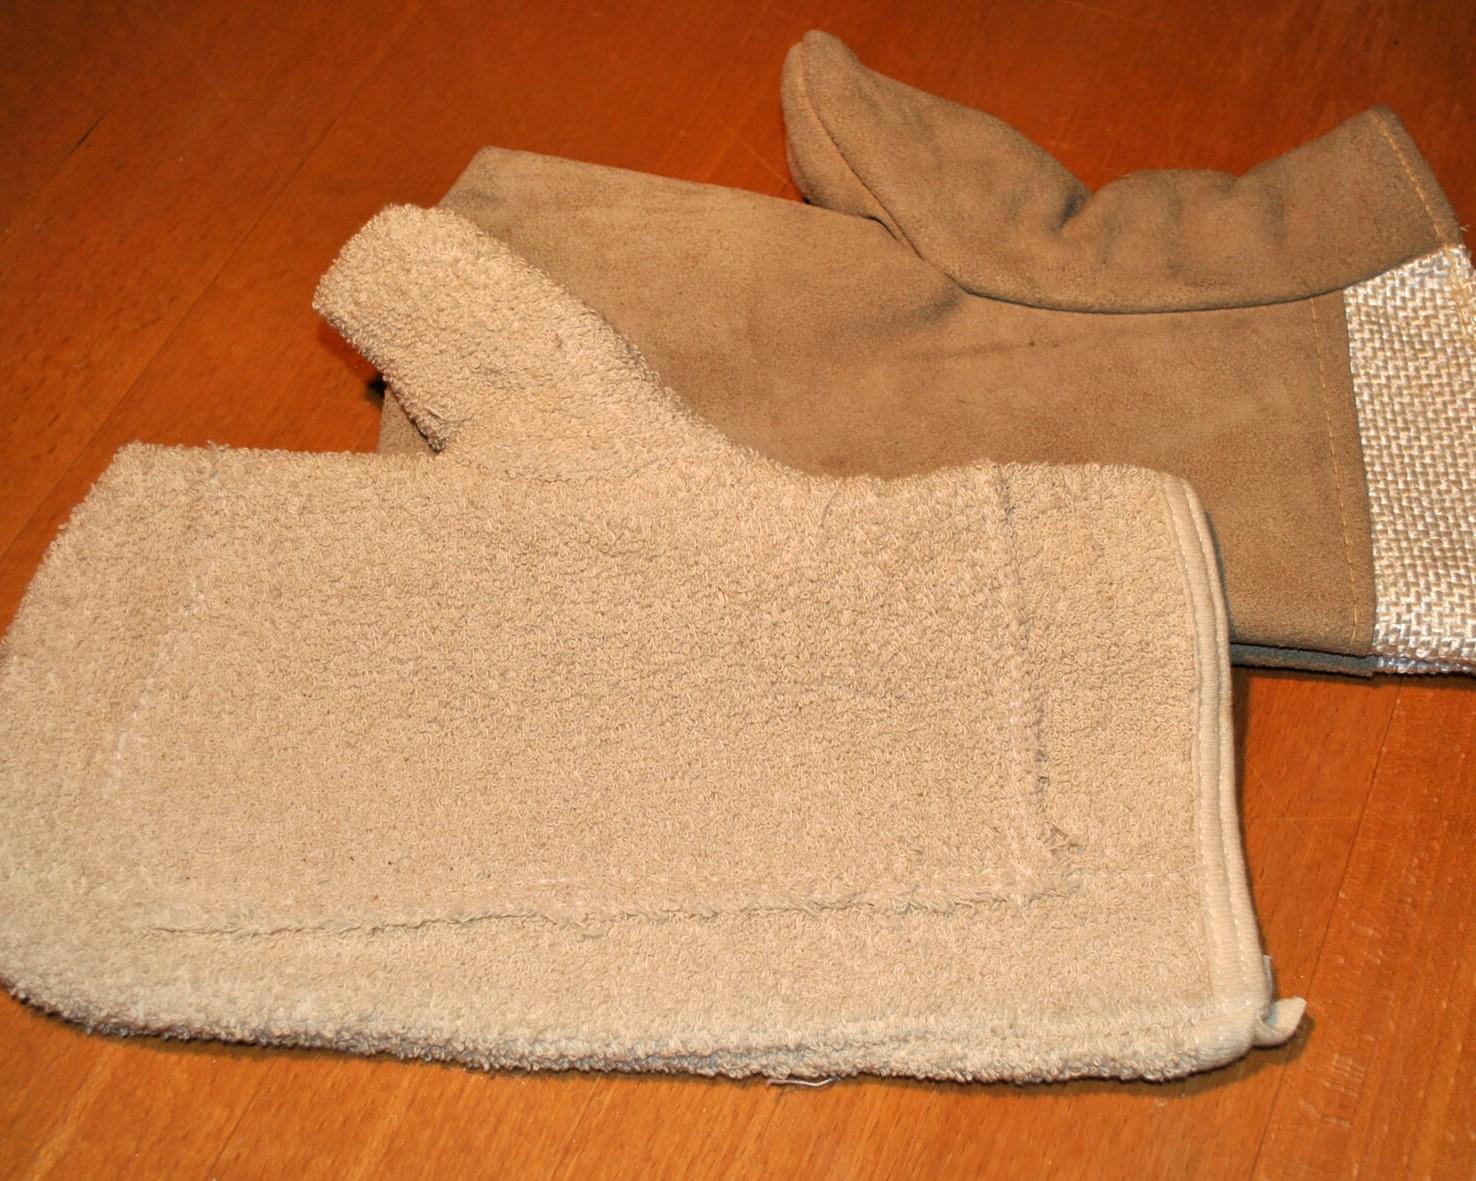 Busam, Holzbackofen, REKORD, Appelt, Holzofenbrot, Handschuhe